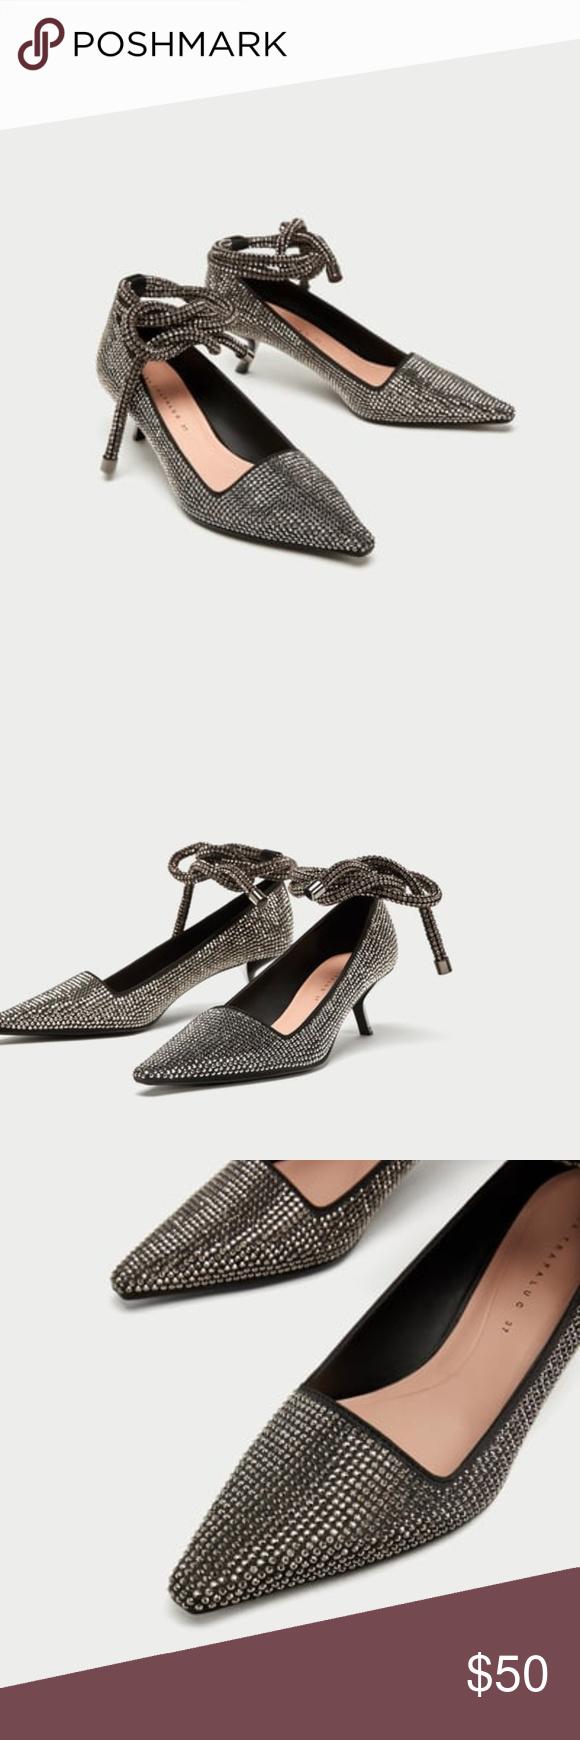 1804e077026 ZARA NEW FW17 SHINY HIGH HEEL COURT SHOES SILVER Silver mid-heel shoes.  Shiny